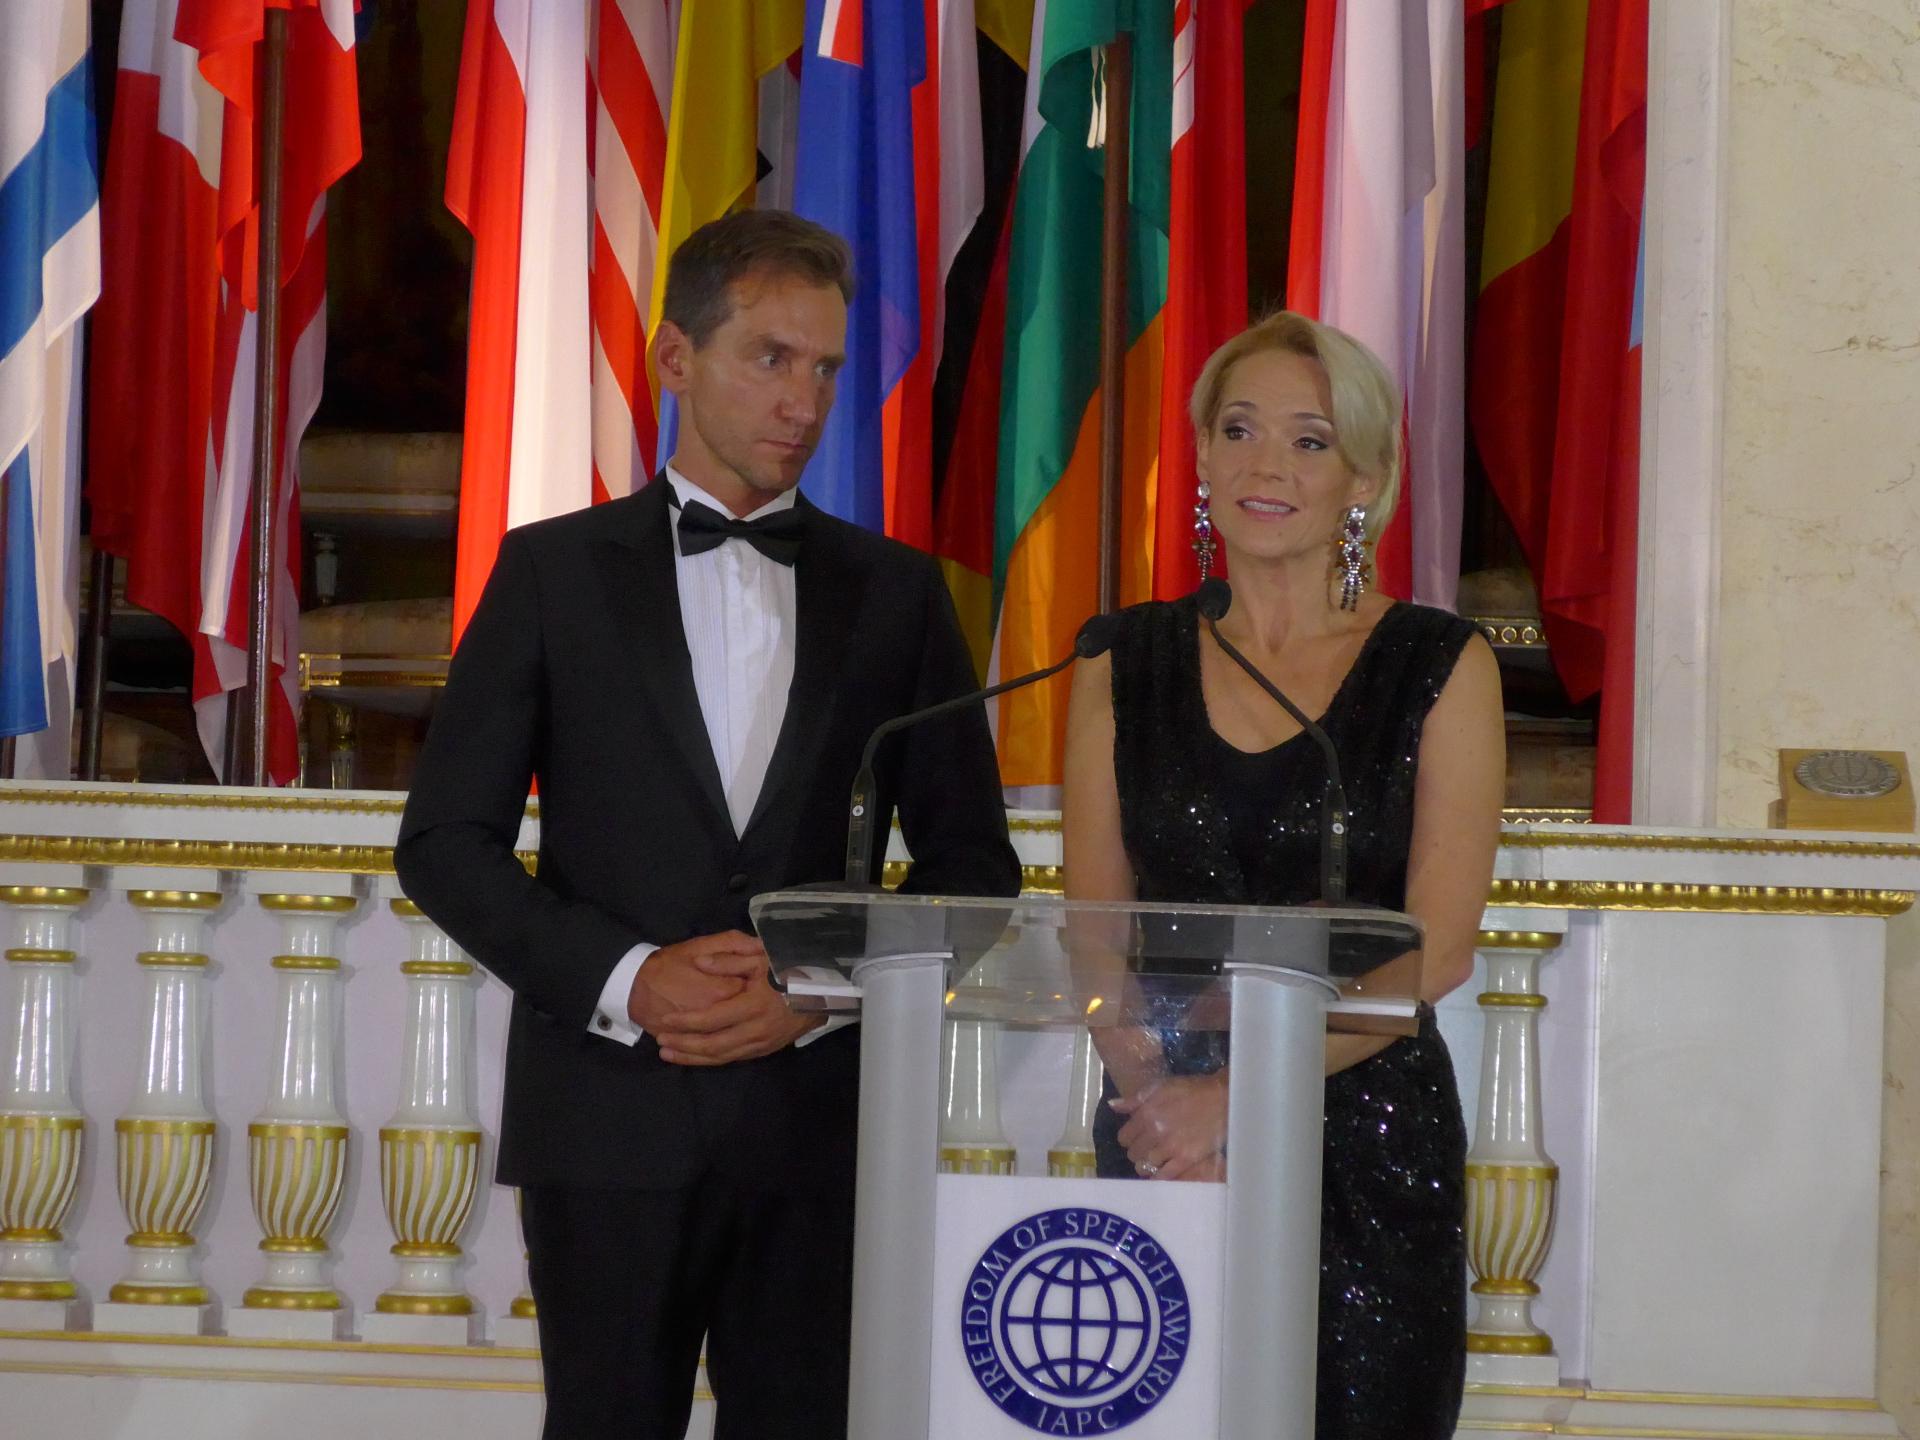 Hosting the IAPC's Freedom of Speech Award, October 2015.